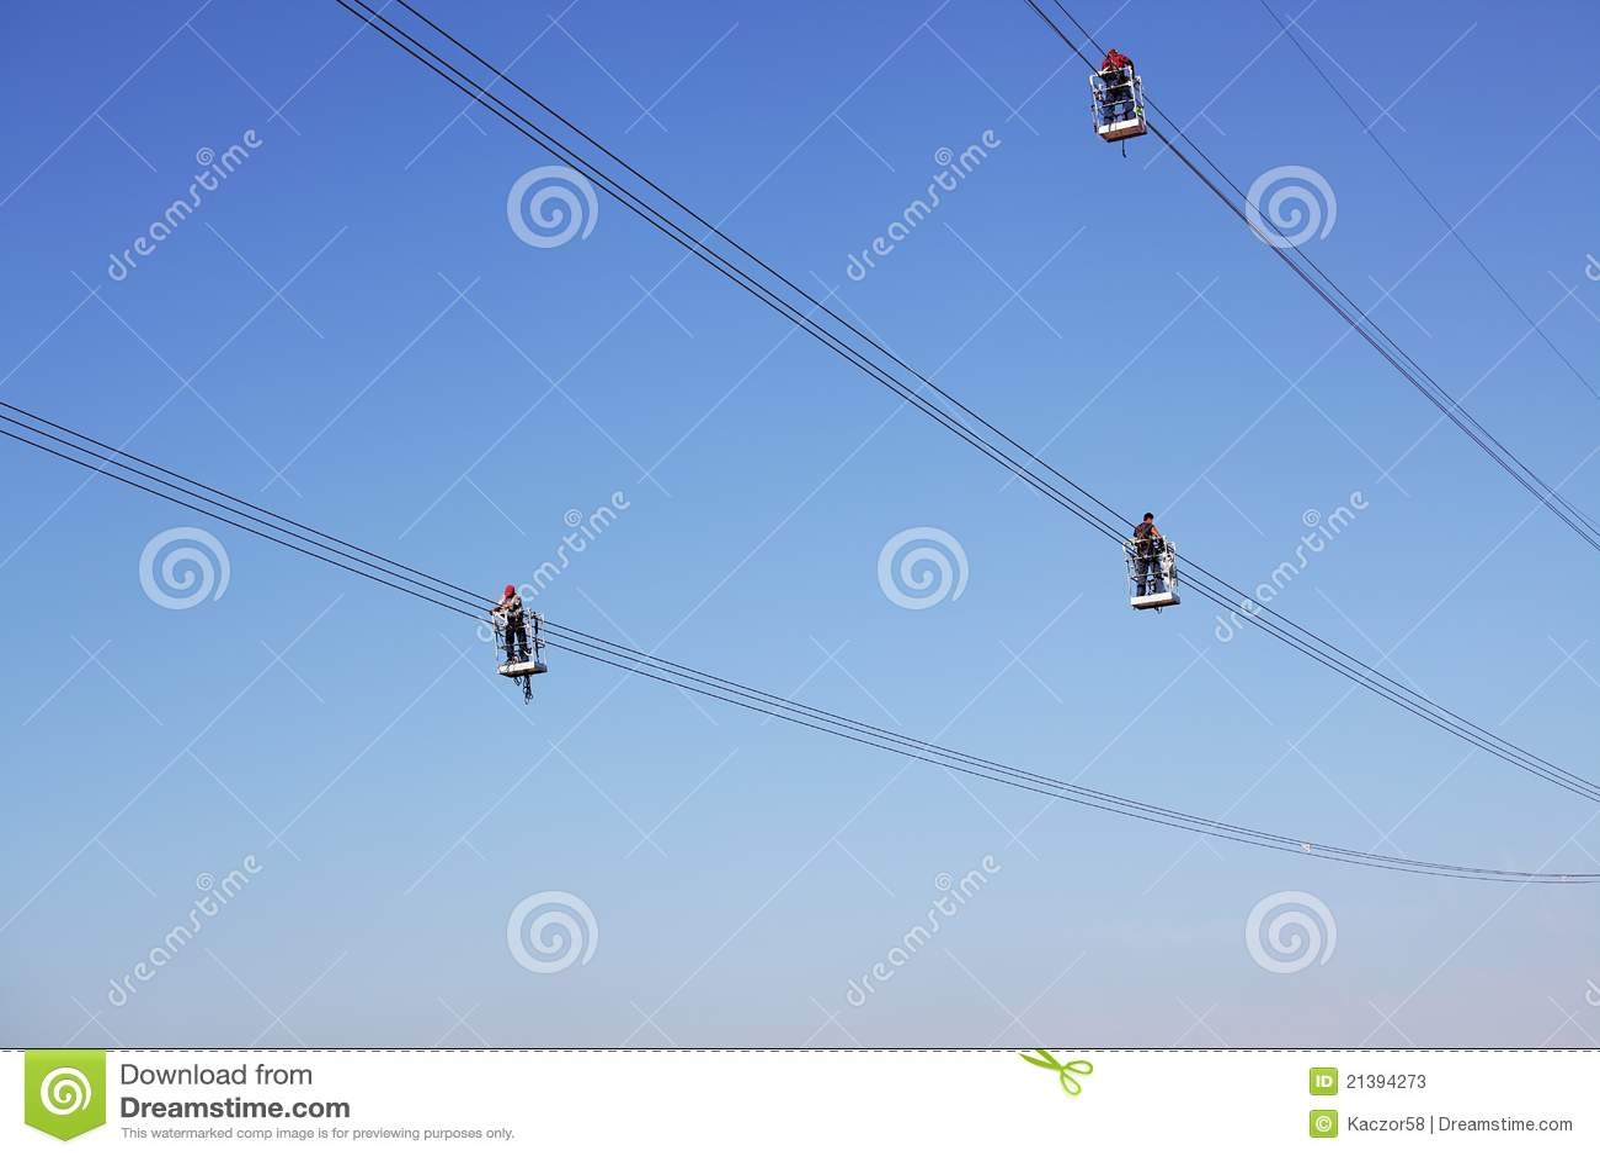 Overhead Power Line Stock Photos Image 21394273